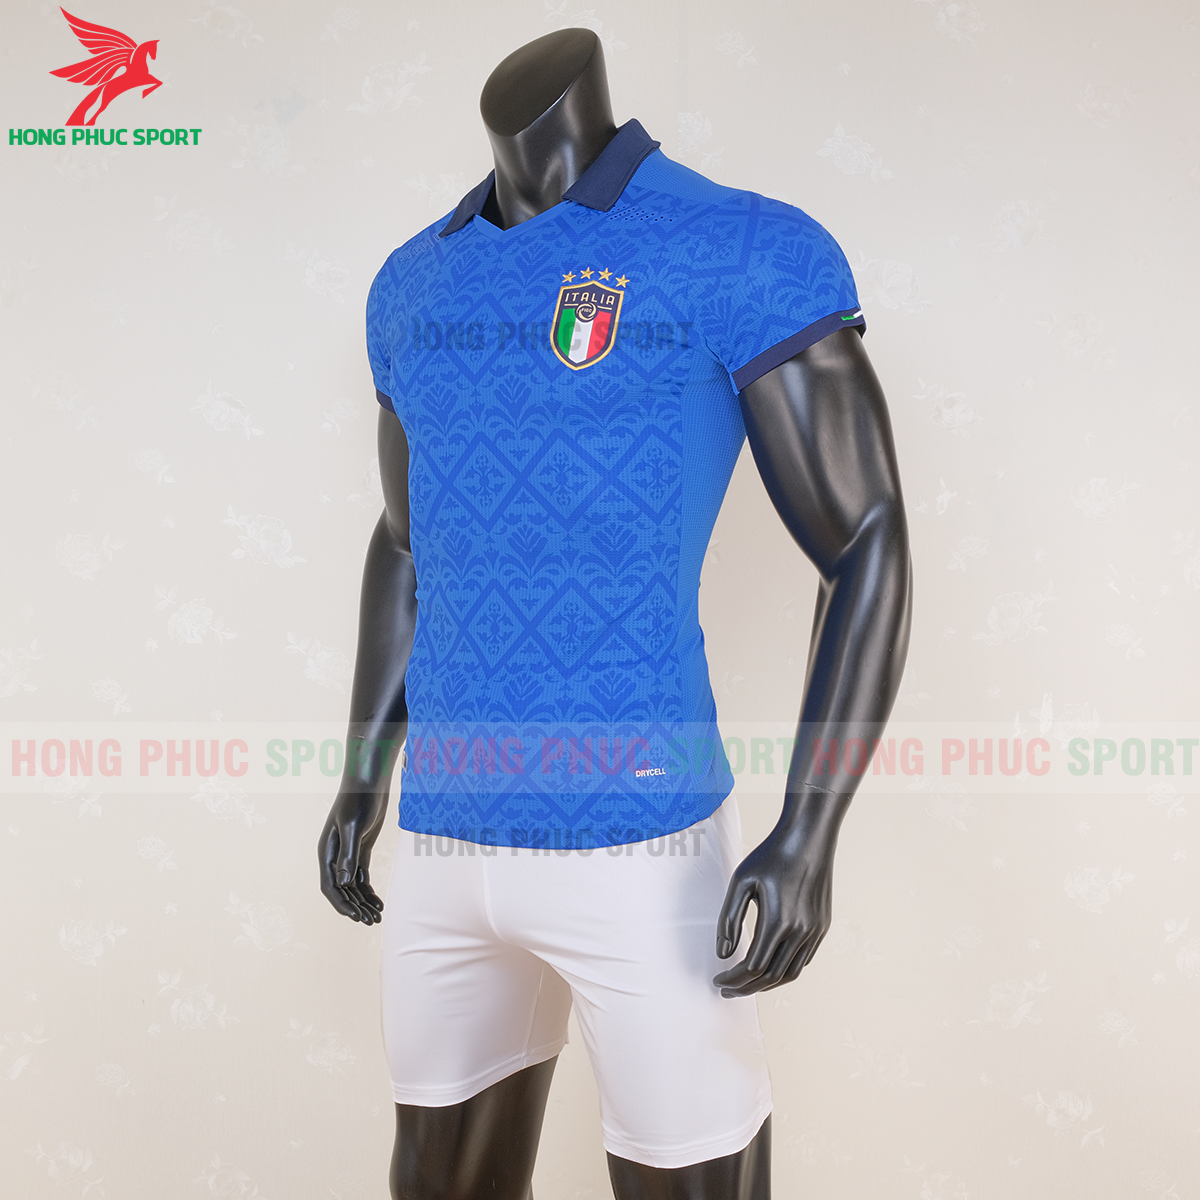 https://cdn.hongphucsport.com/unsafe/s4.shopbay.vn/files/285/ao-bong-da-tuyen-y-san-nha-2020-4-5f6ebd7141fe1.png